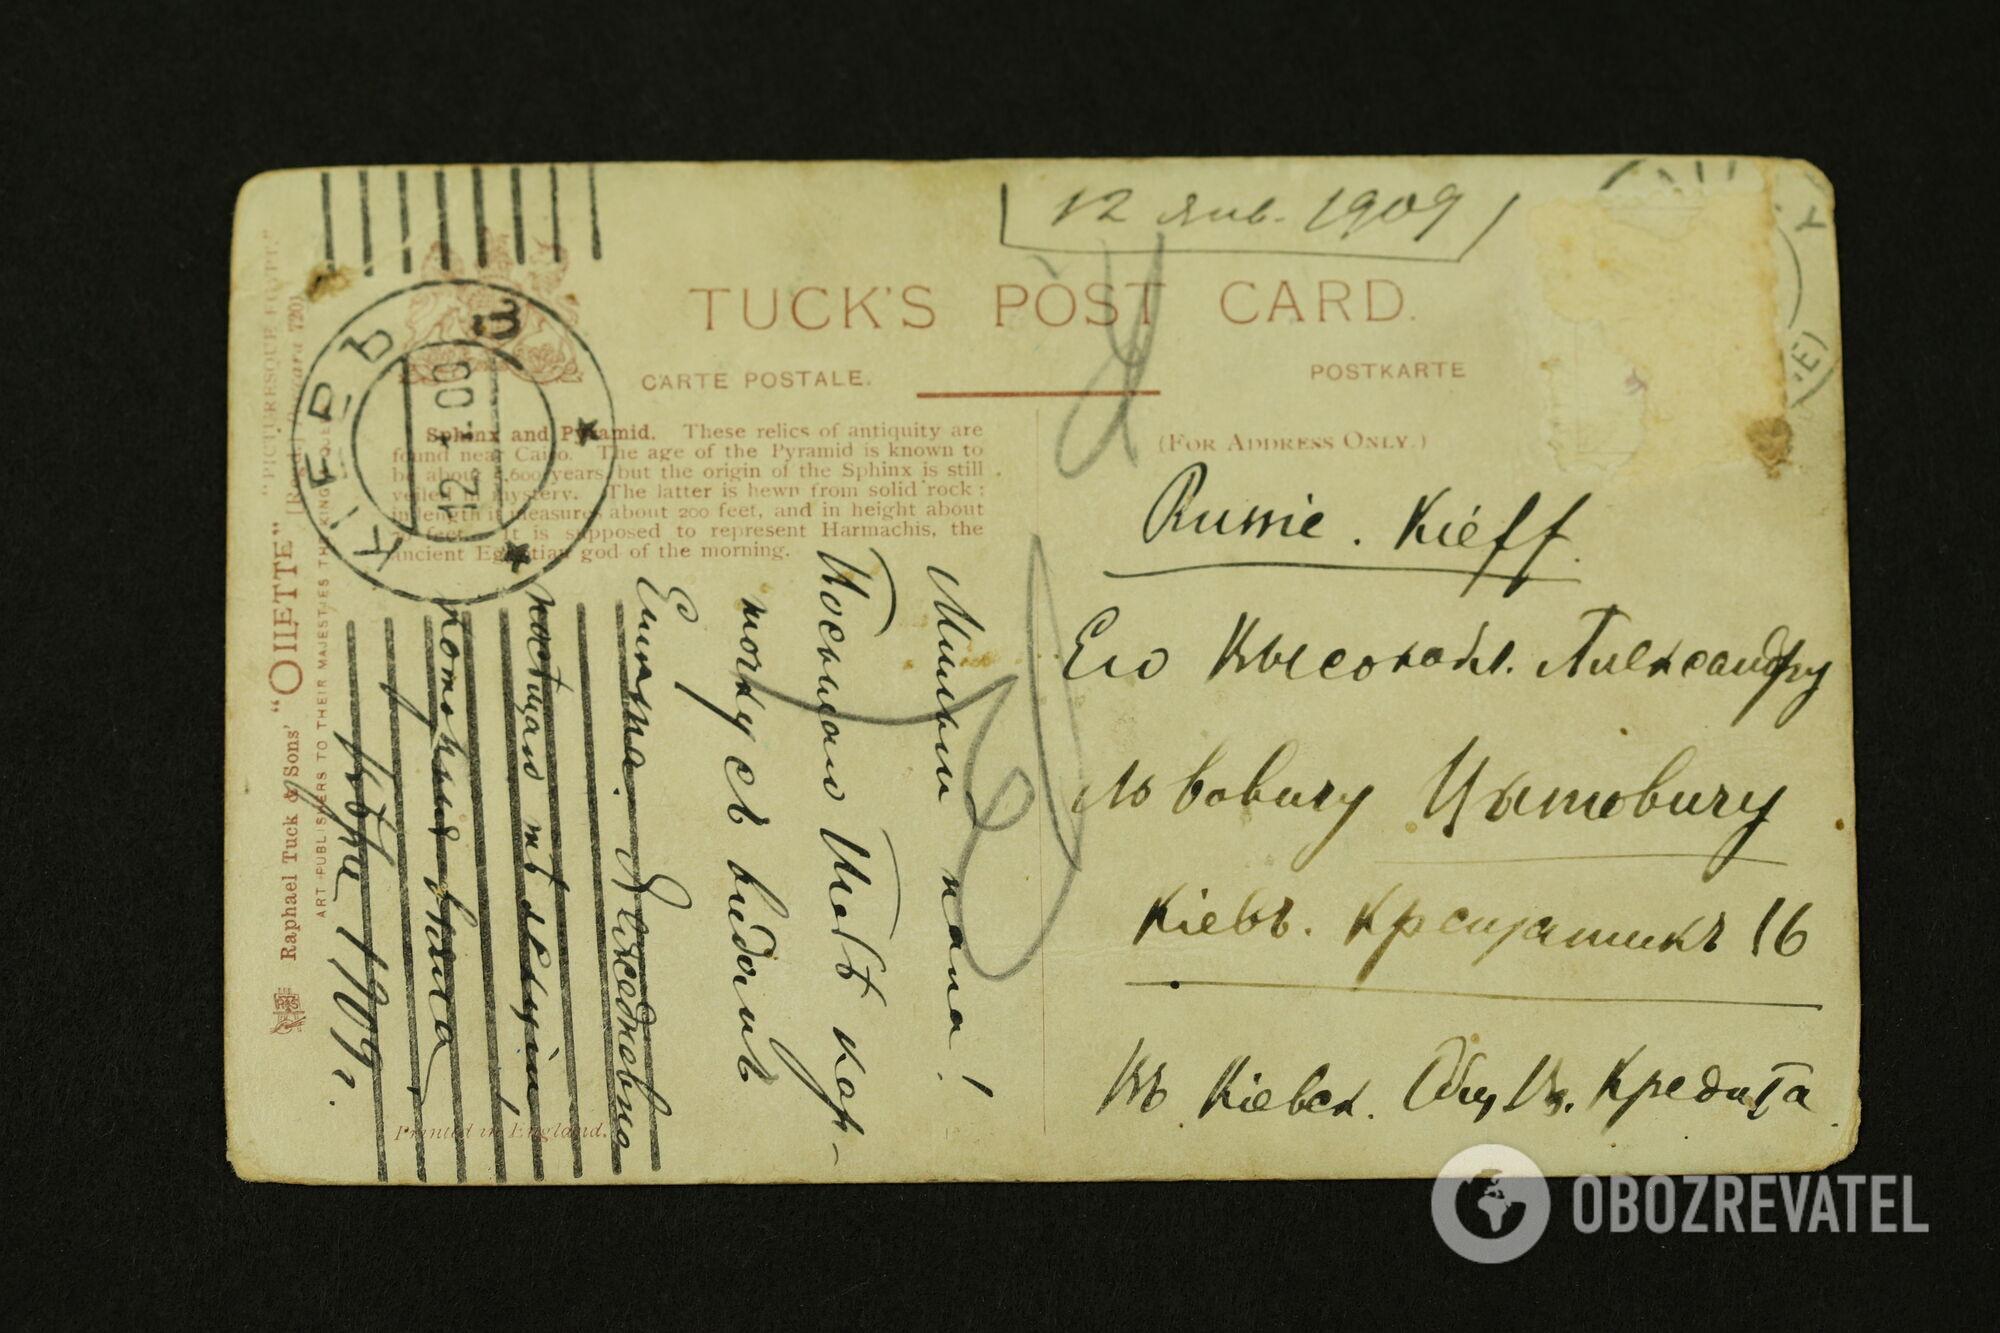 Лист дочки глави київського Товариства взаємного кредиту